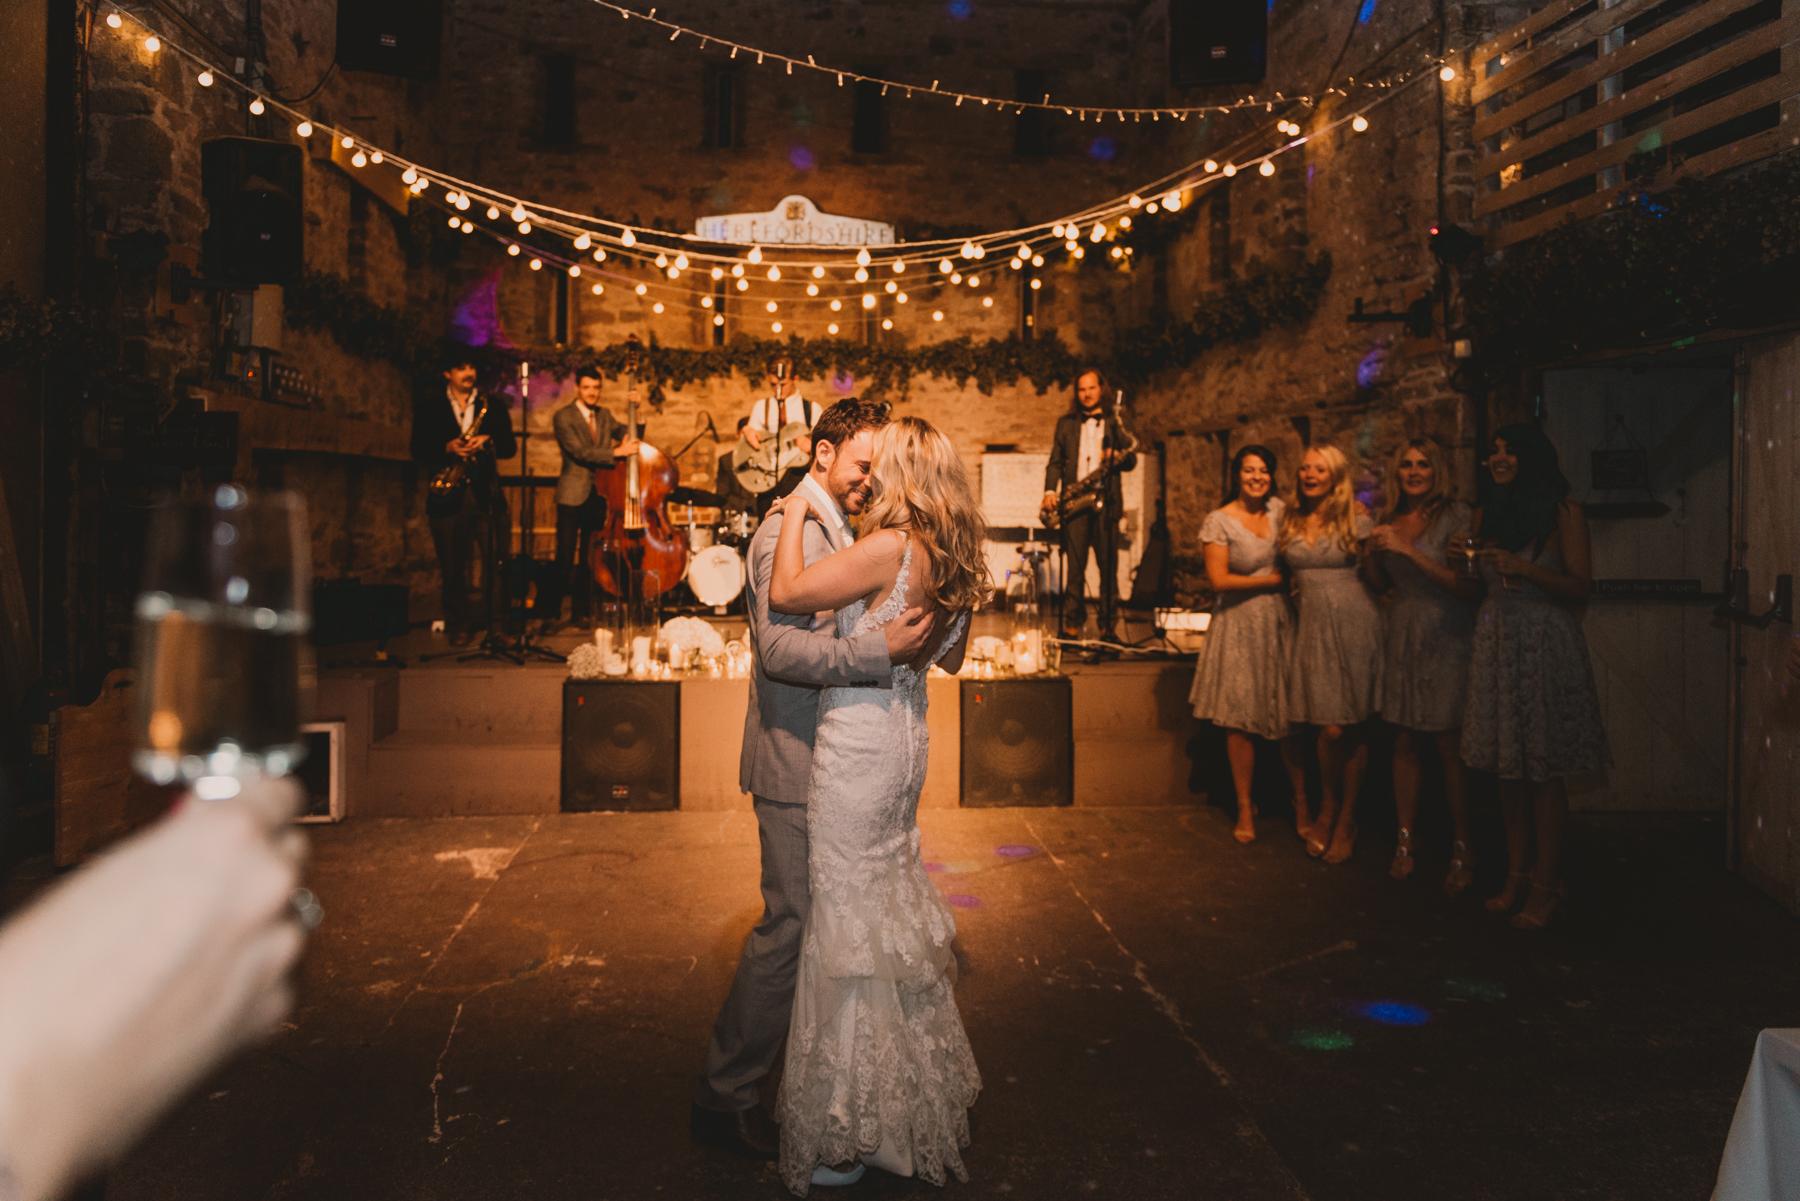 Herefordshire-barn-wedding-highlights-146.jpg